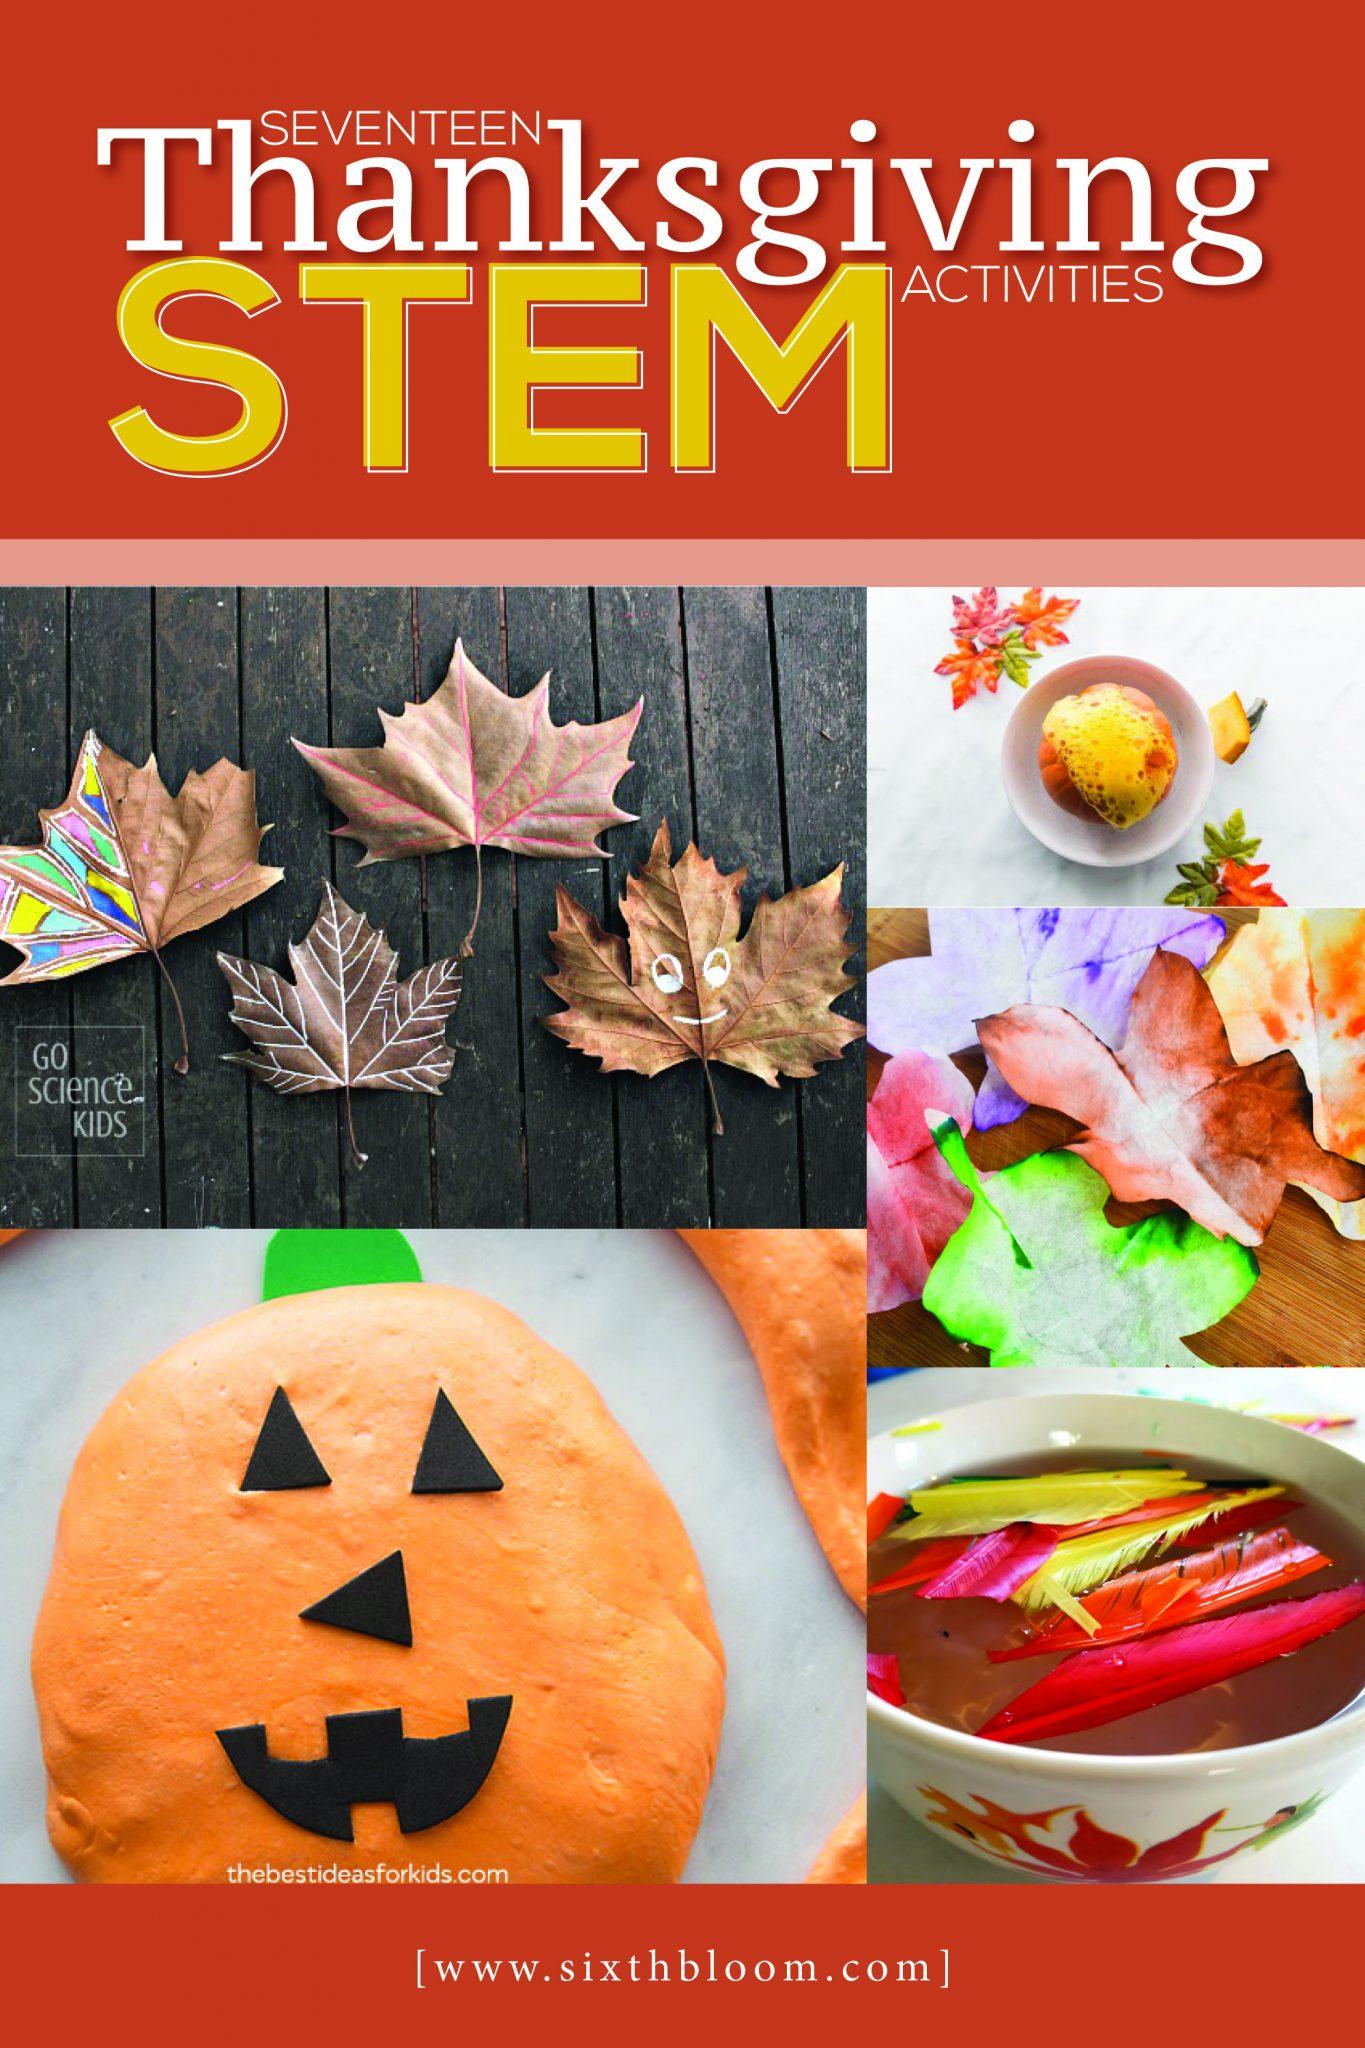 17 Thanksgiving Stem Activities Sixth Bloom